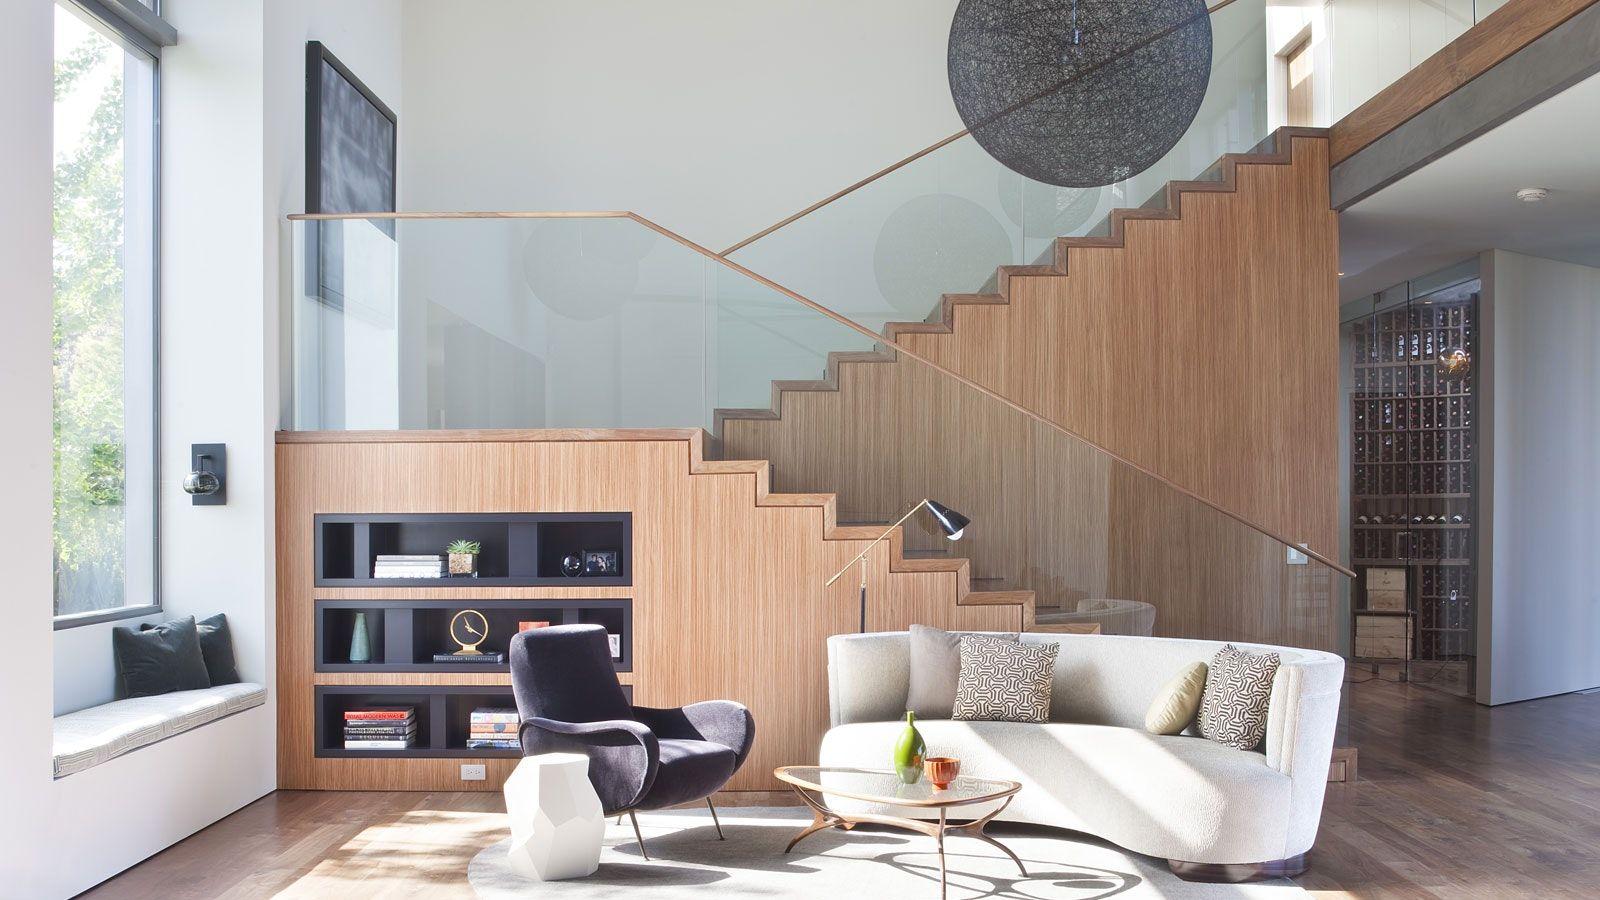 Chautauqua Residence | Staircase design, Interior design, Home